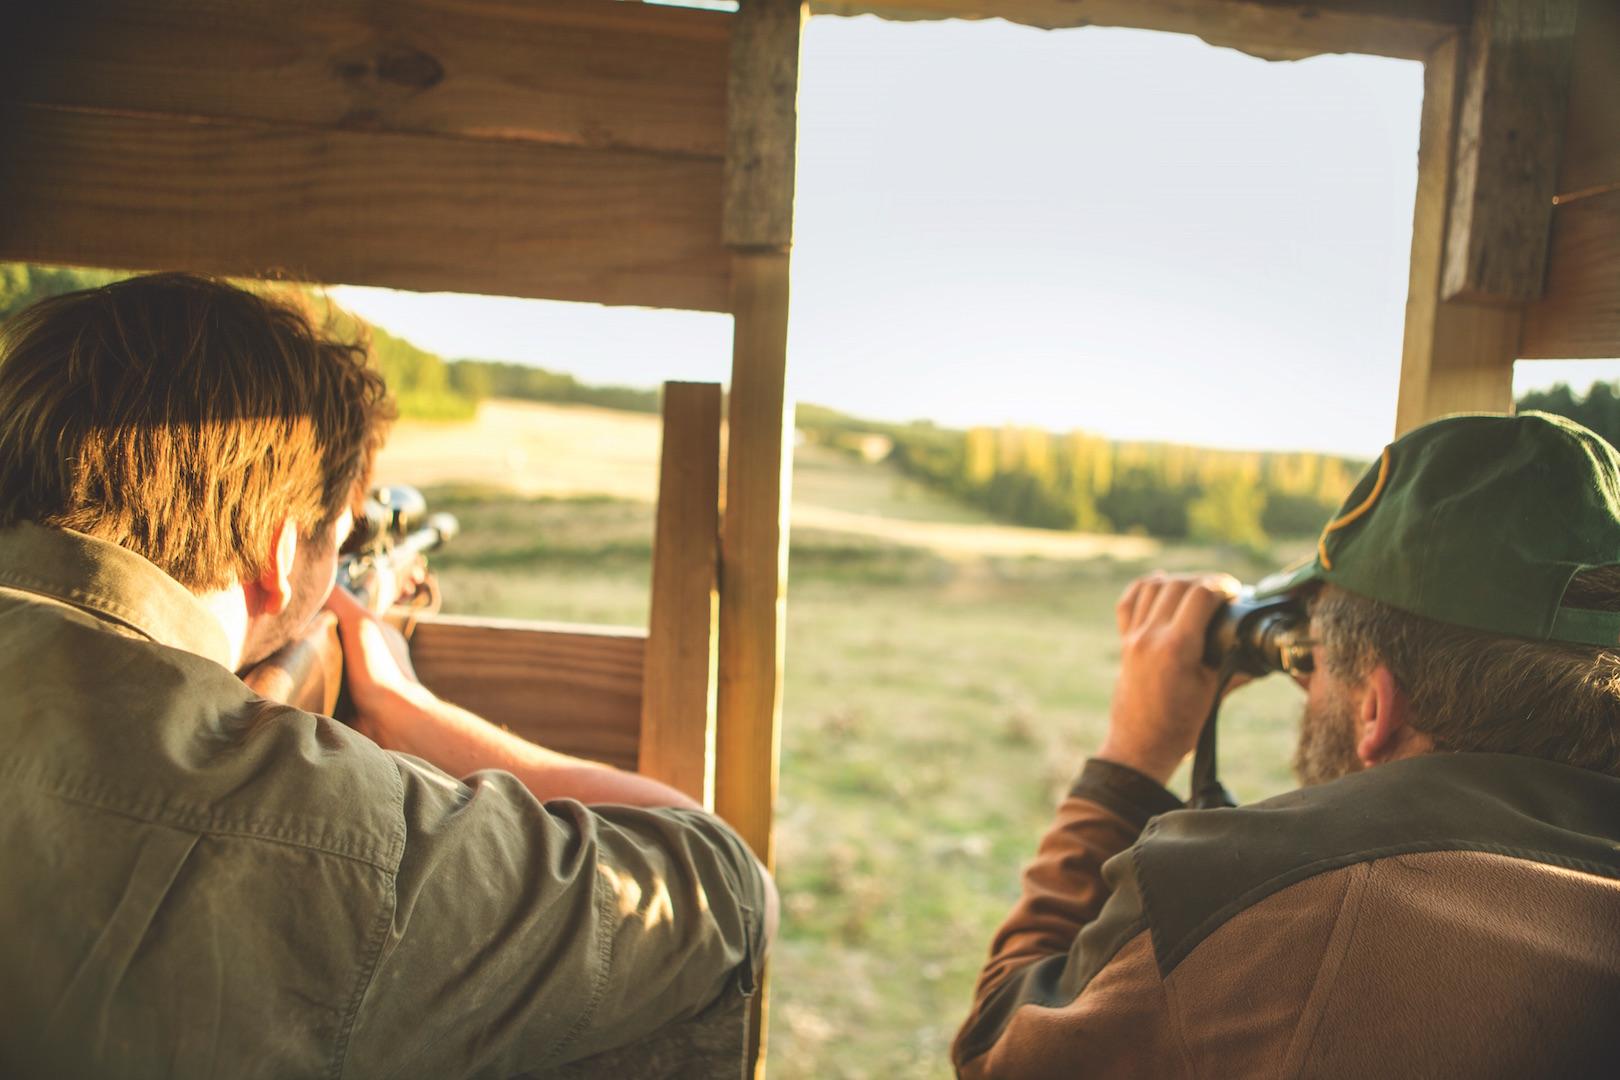 jaeger jaegermagazin chile hirsch rothirsch brunft auslandsjagd jagdreise Lucy Martens hunting redstag